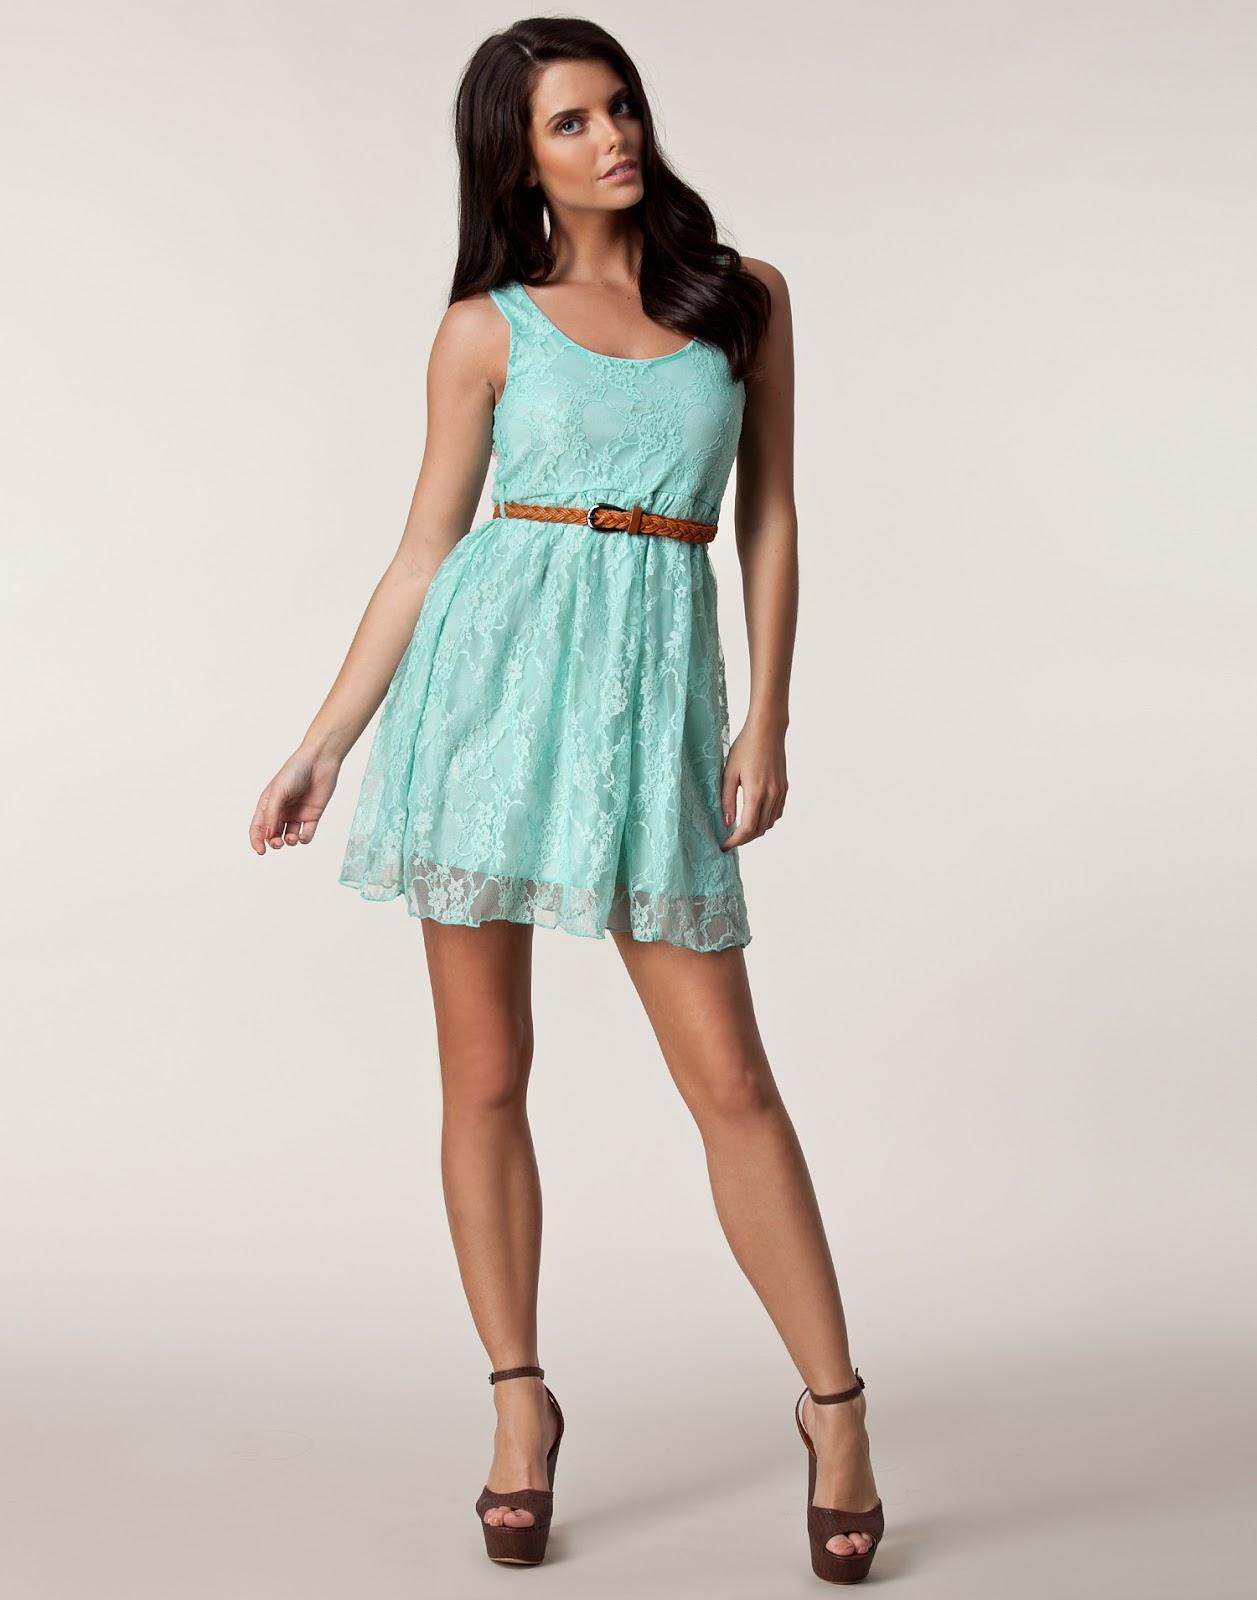 b5e62db10b Vestido azul turquesa casual - Vestidos cortos populares